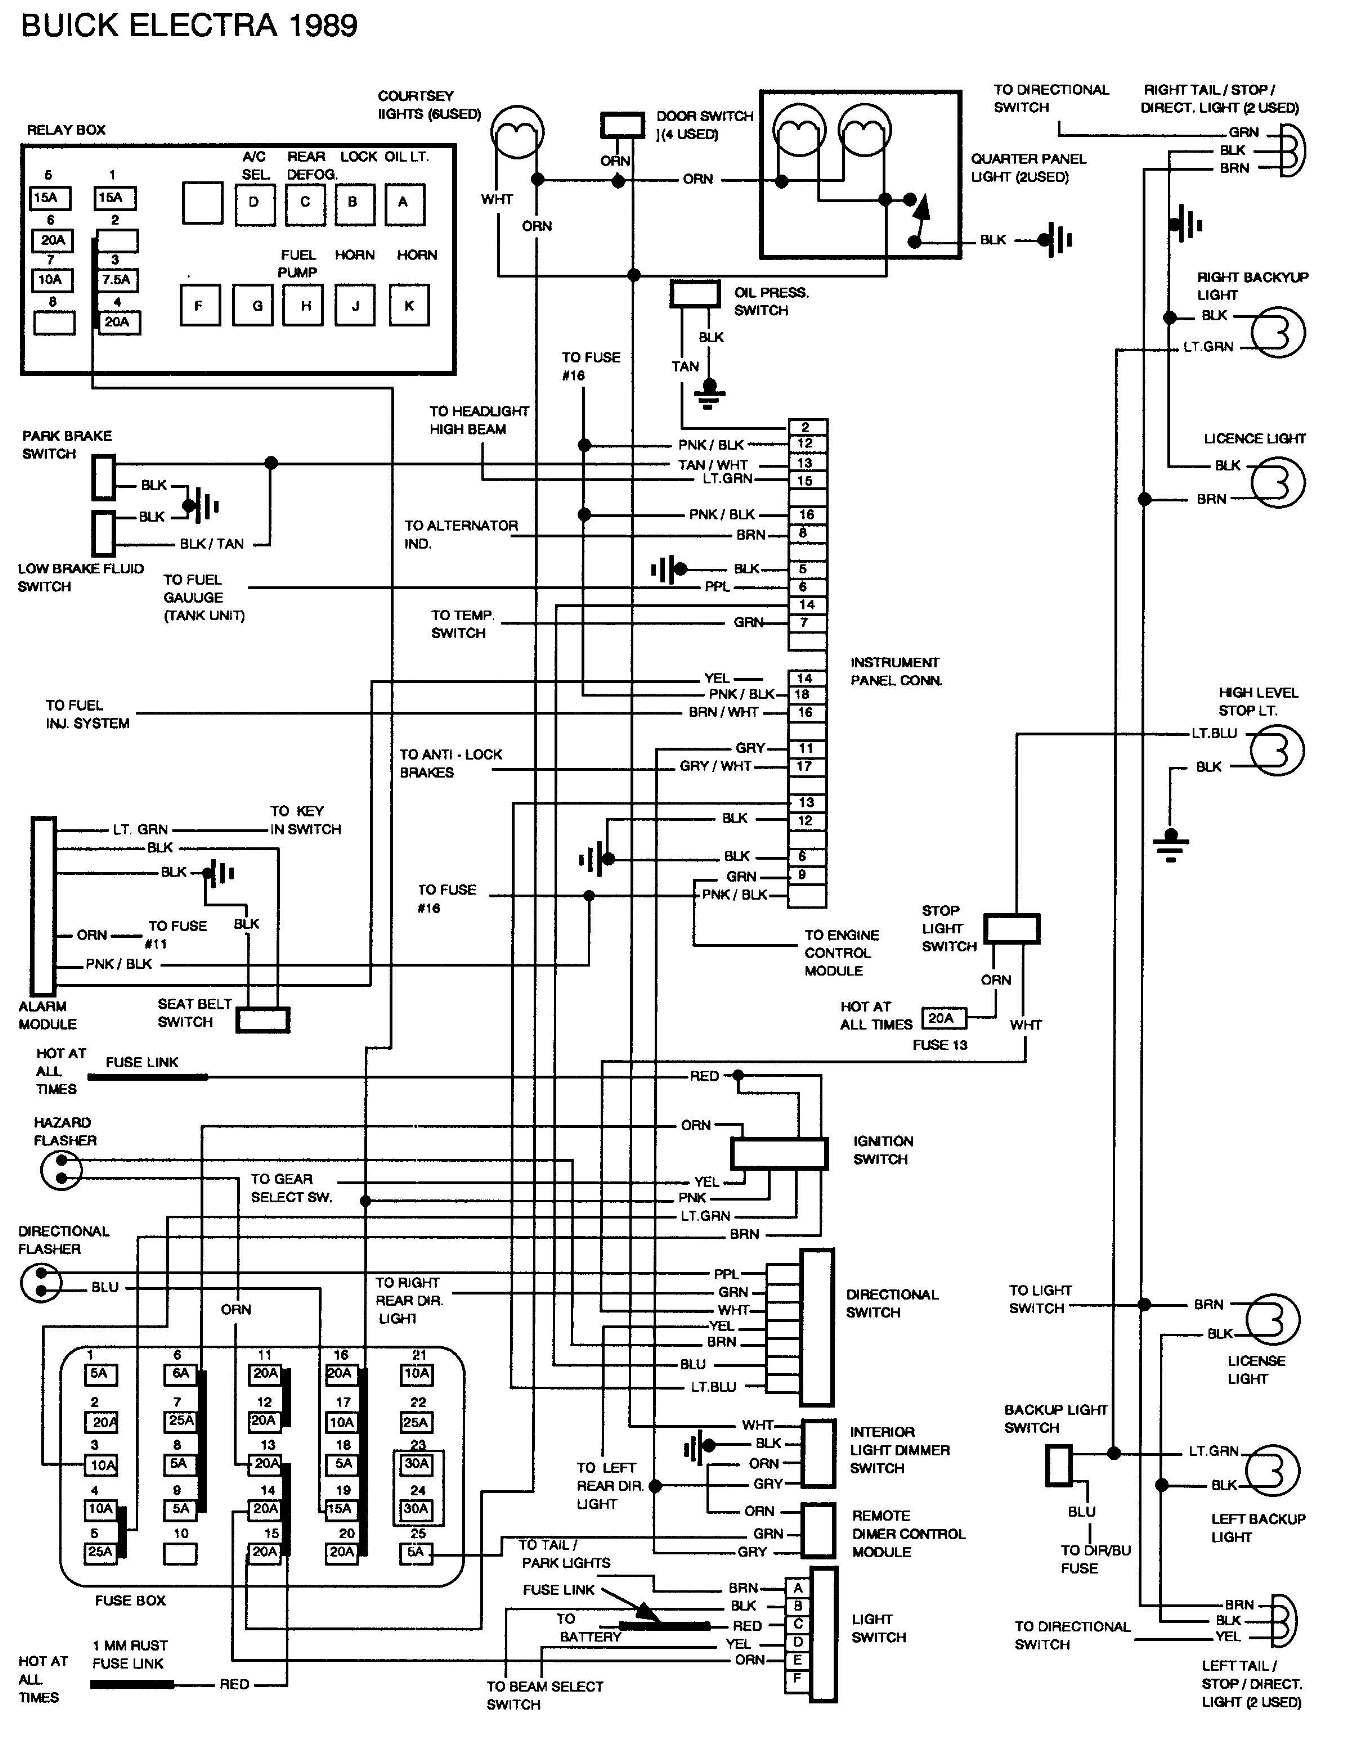 1995 Buick Riviera Radio Wiring Diagram Wiring Diagram Thick Procedure Thick Procedure Bowlingronta It